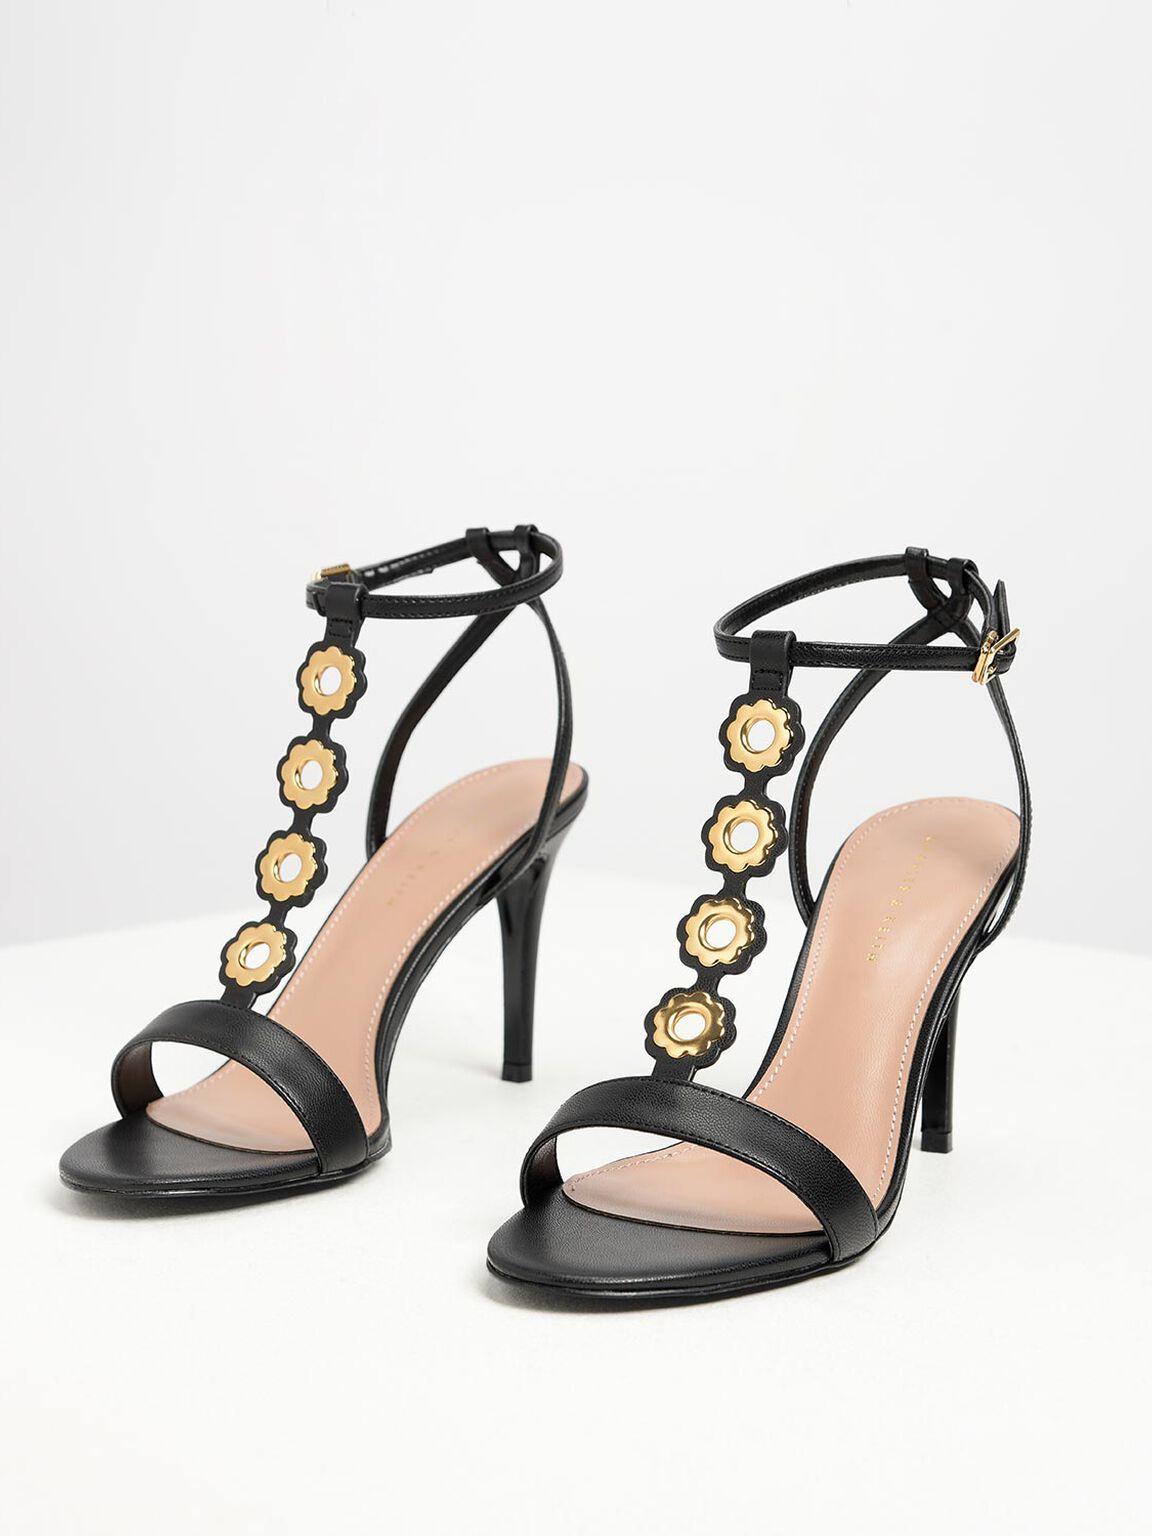 Floral Eyelet Heels, Black, hi-res